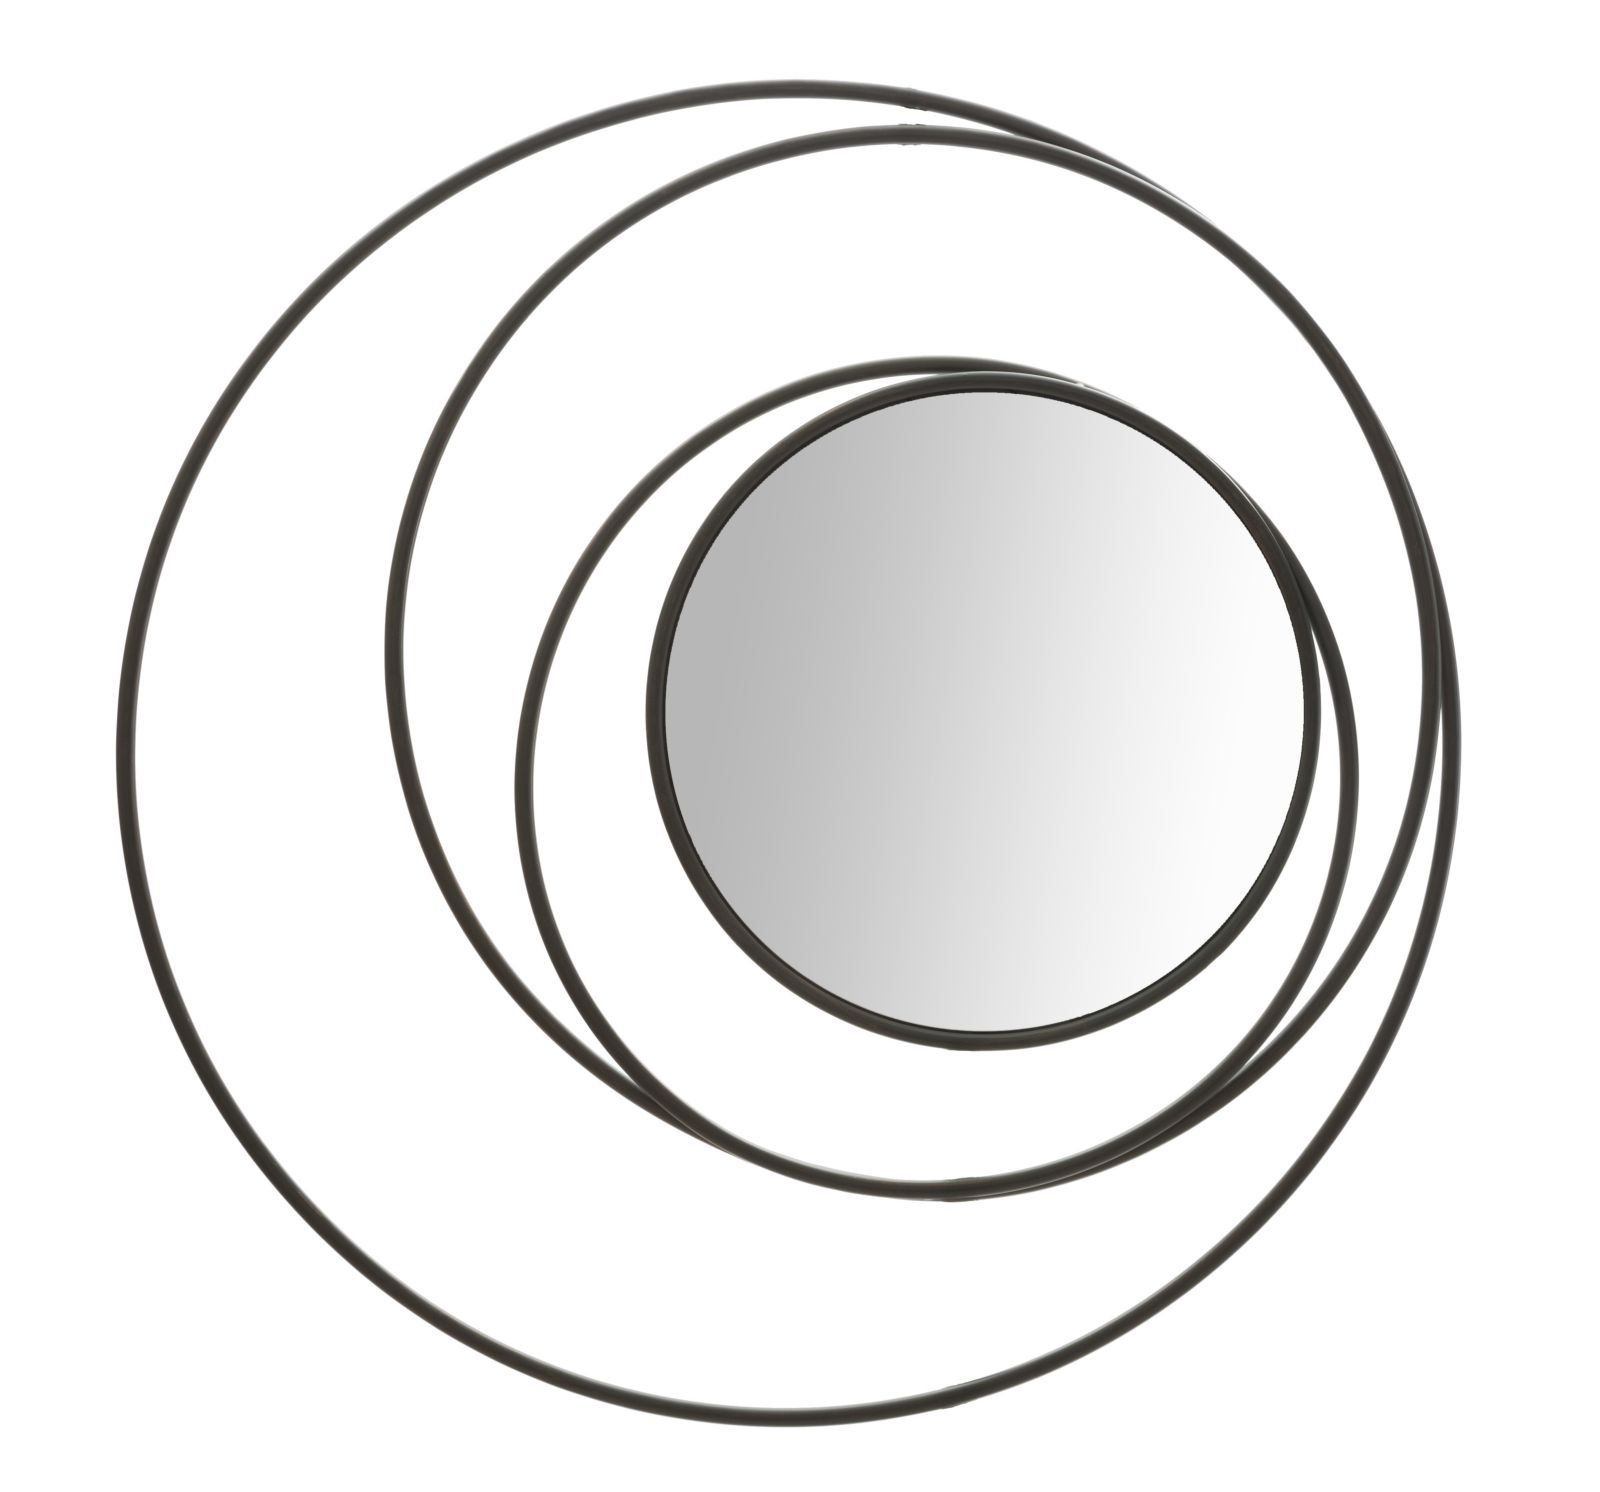 Oglinda decorativa din metal Circles Negru, Ø80 cm